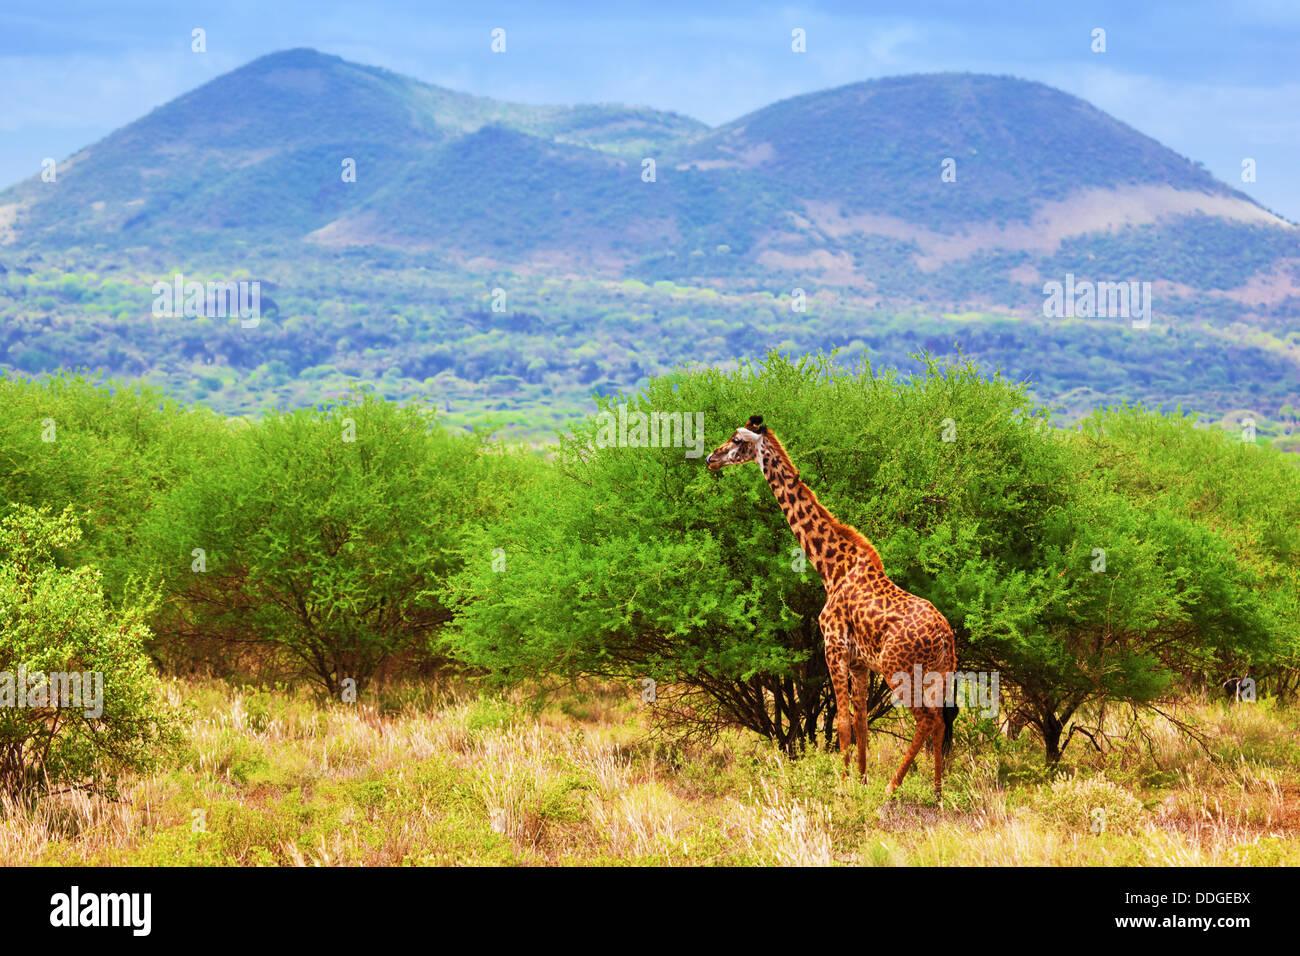 Giraffe in Tsavo West National Park, Kenya, Africa - African wildlife - Stock Image